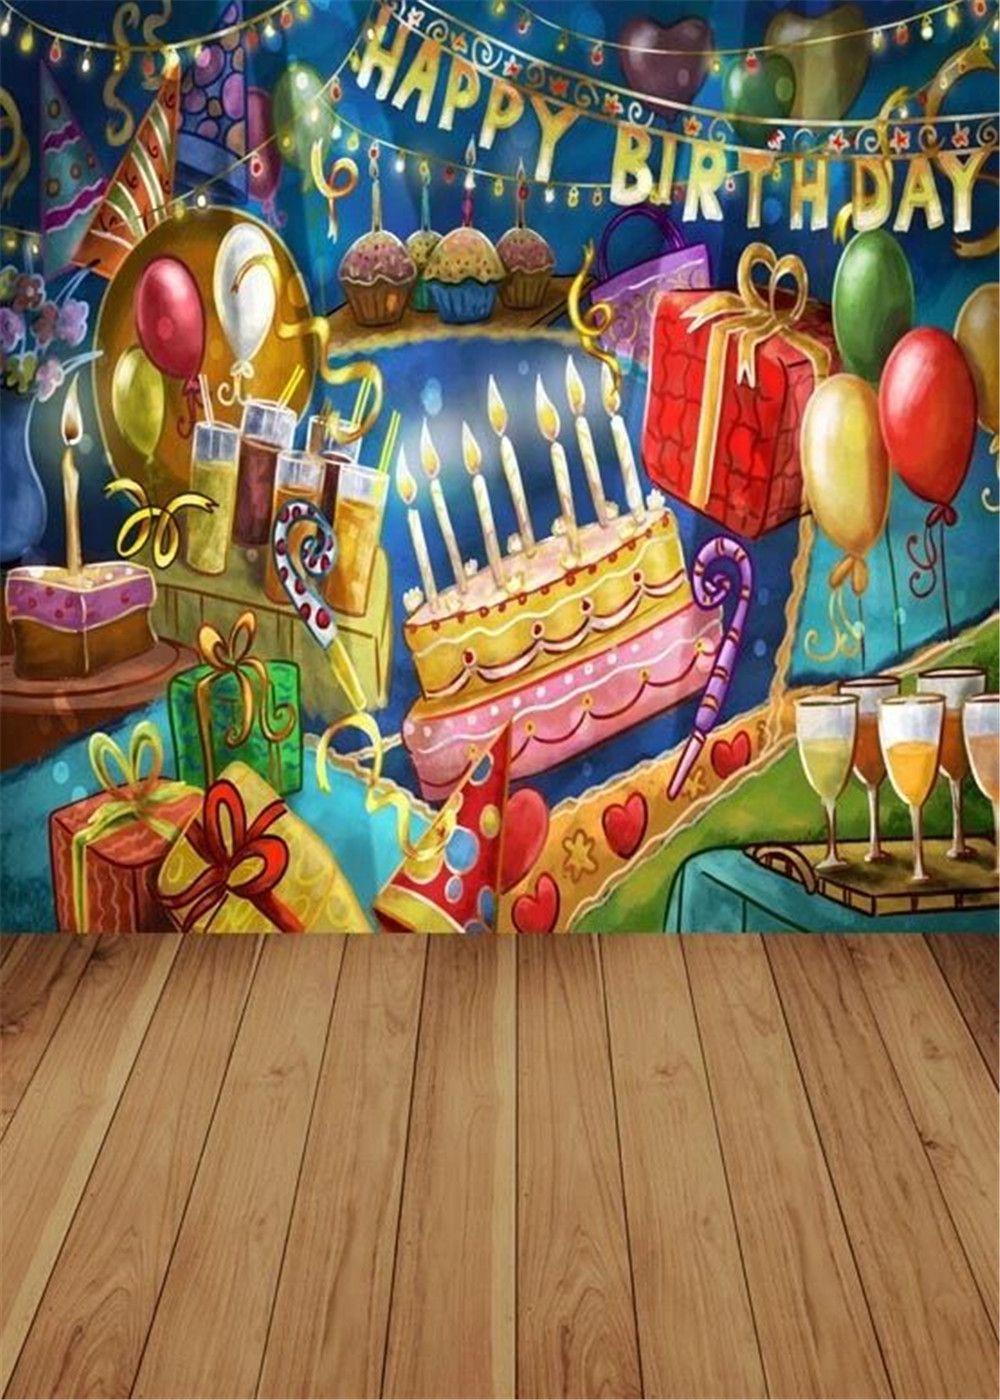 Graffiti wall vinyl - 2017 Graffiti Wall Happy Birthday Photography Backdrops Vinyl Printed Cake Gift Boxes Balloons Children Photo Studio Background Wood Floor From